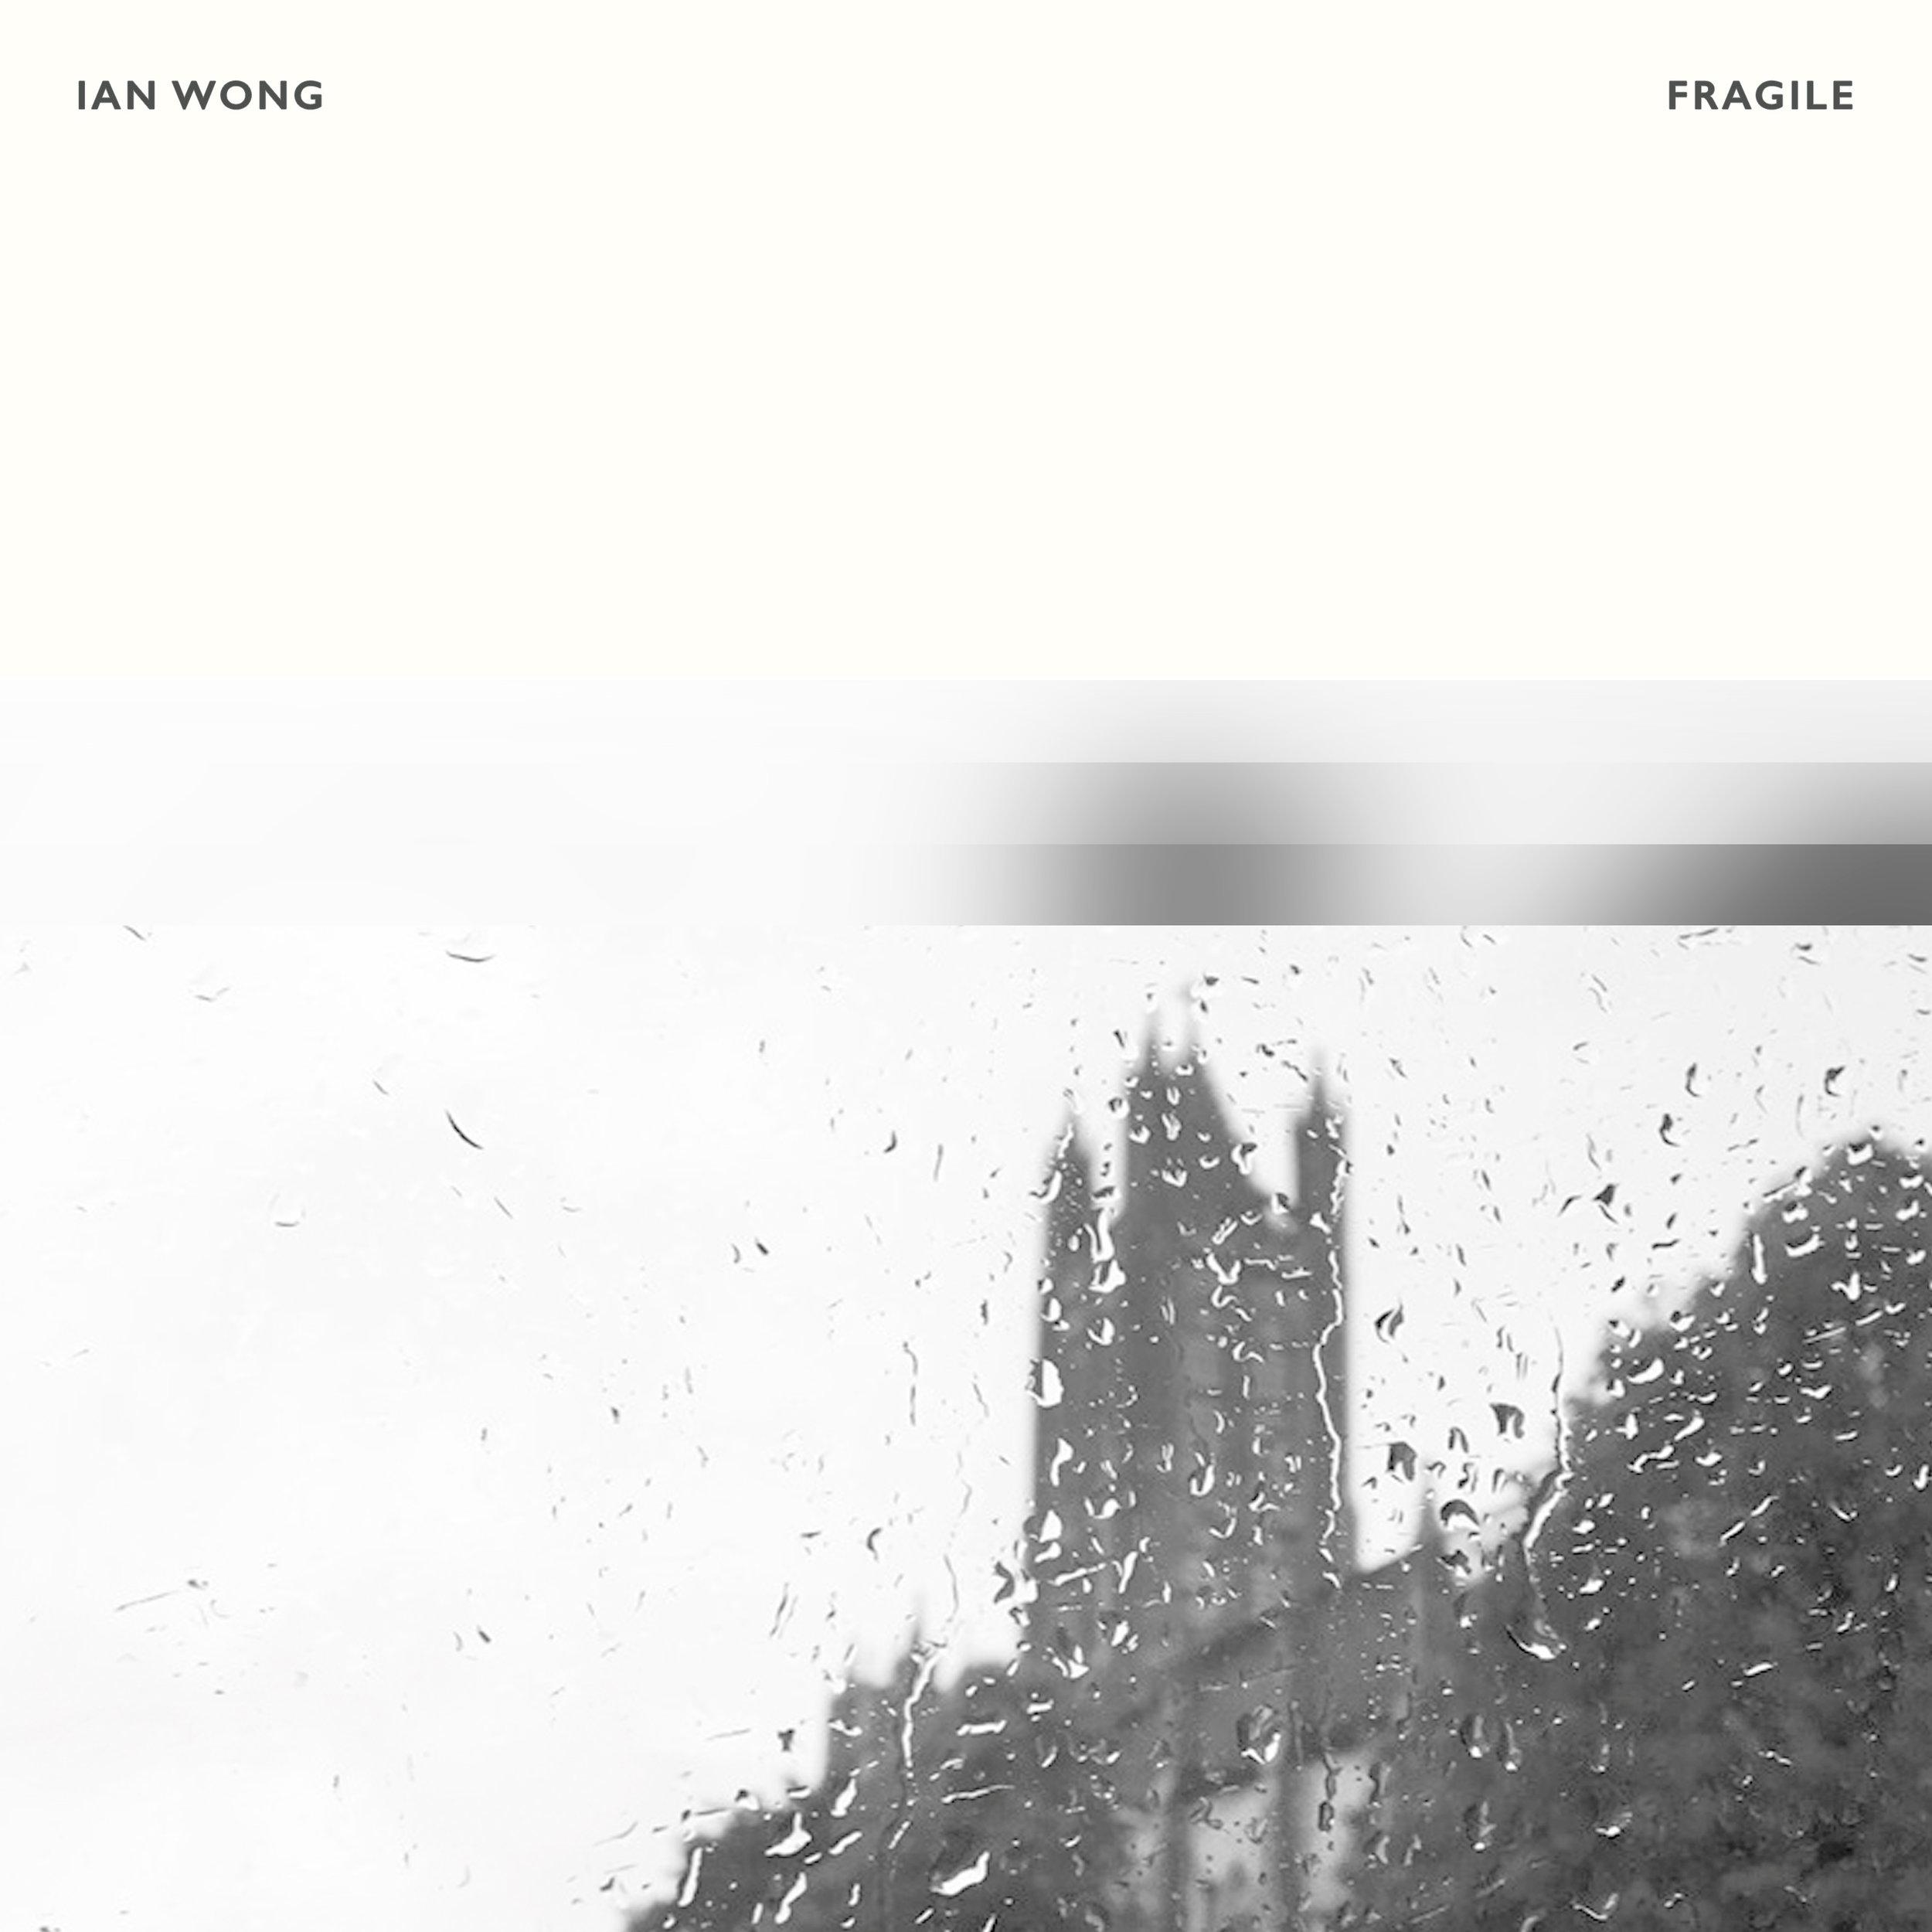 Ian Wong - Fragile